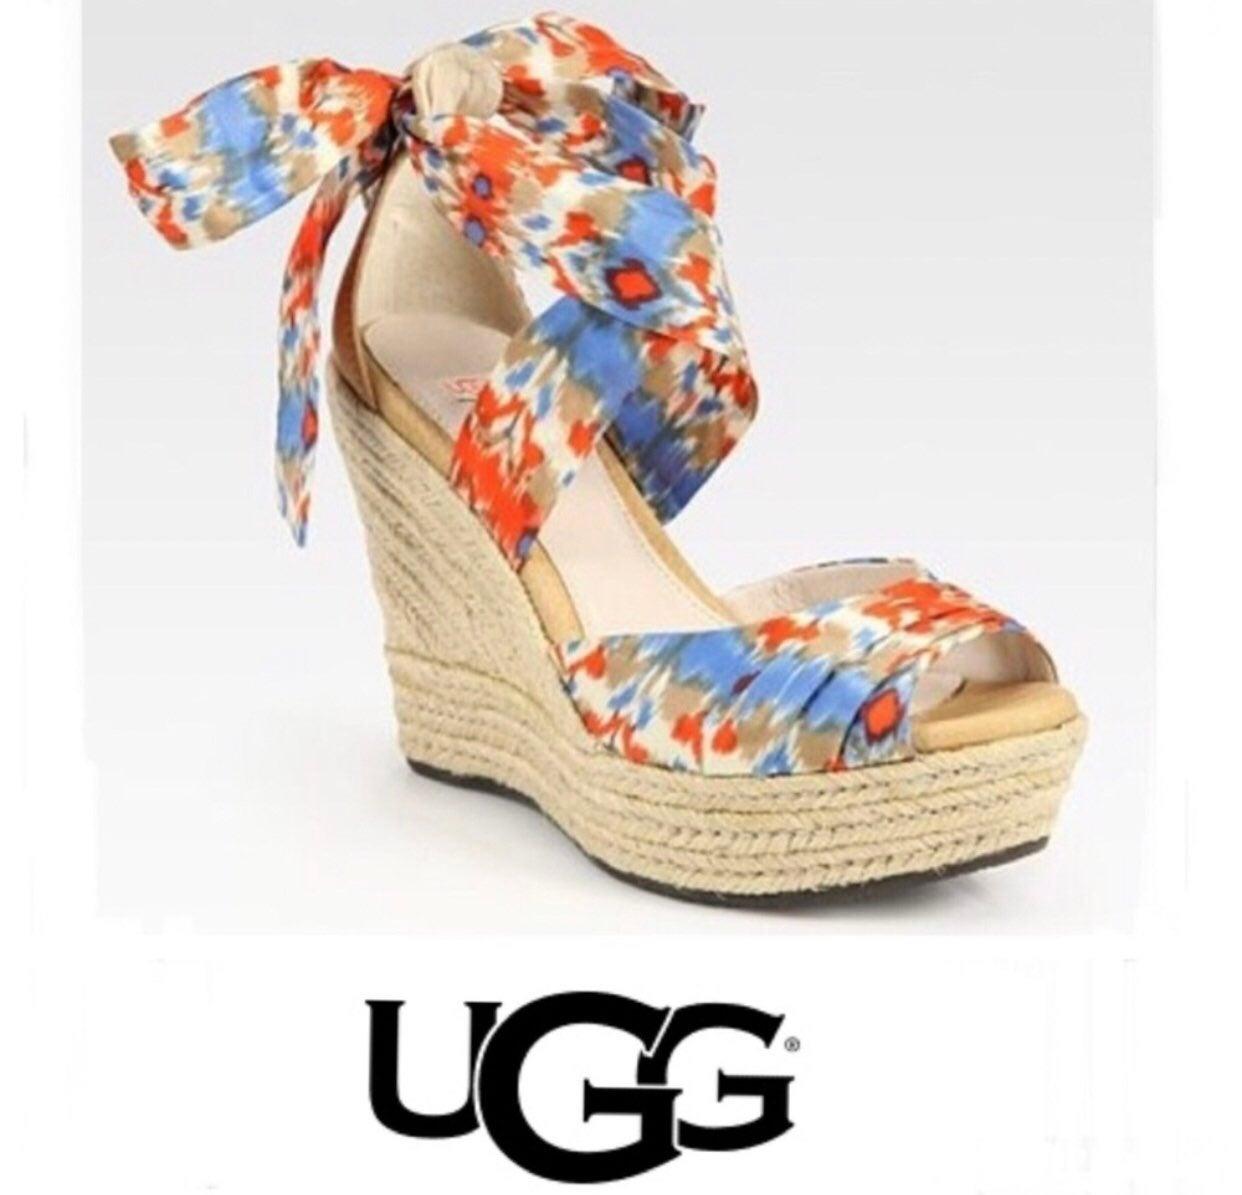 UGG Lucianna Espadrilles Wedge Sandal 10